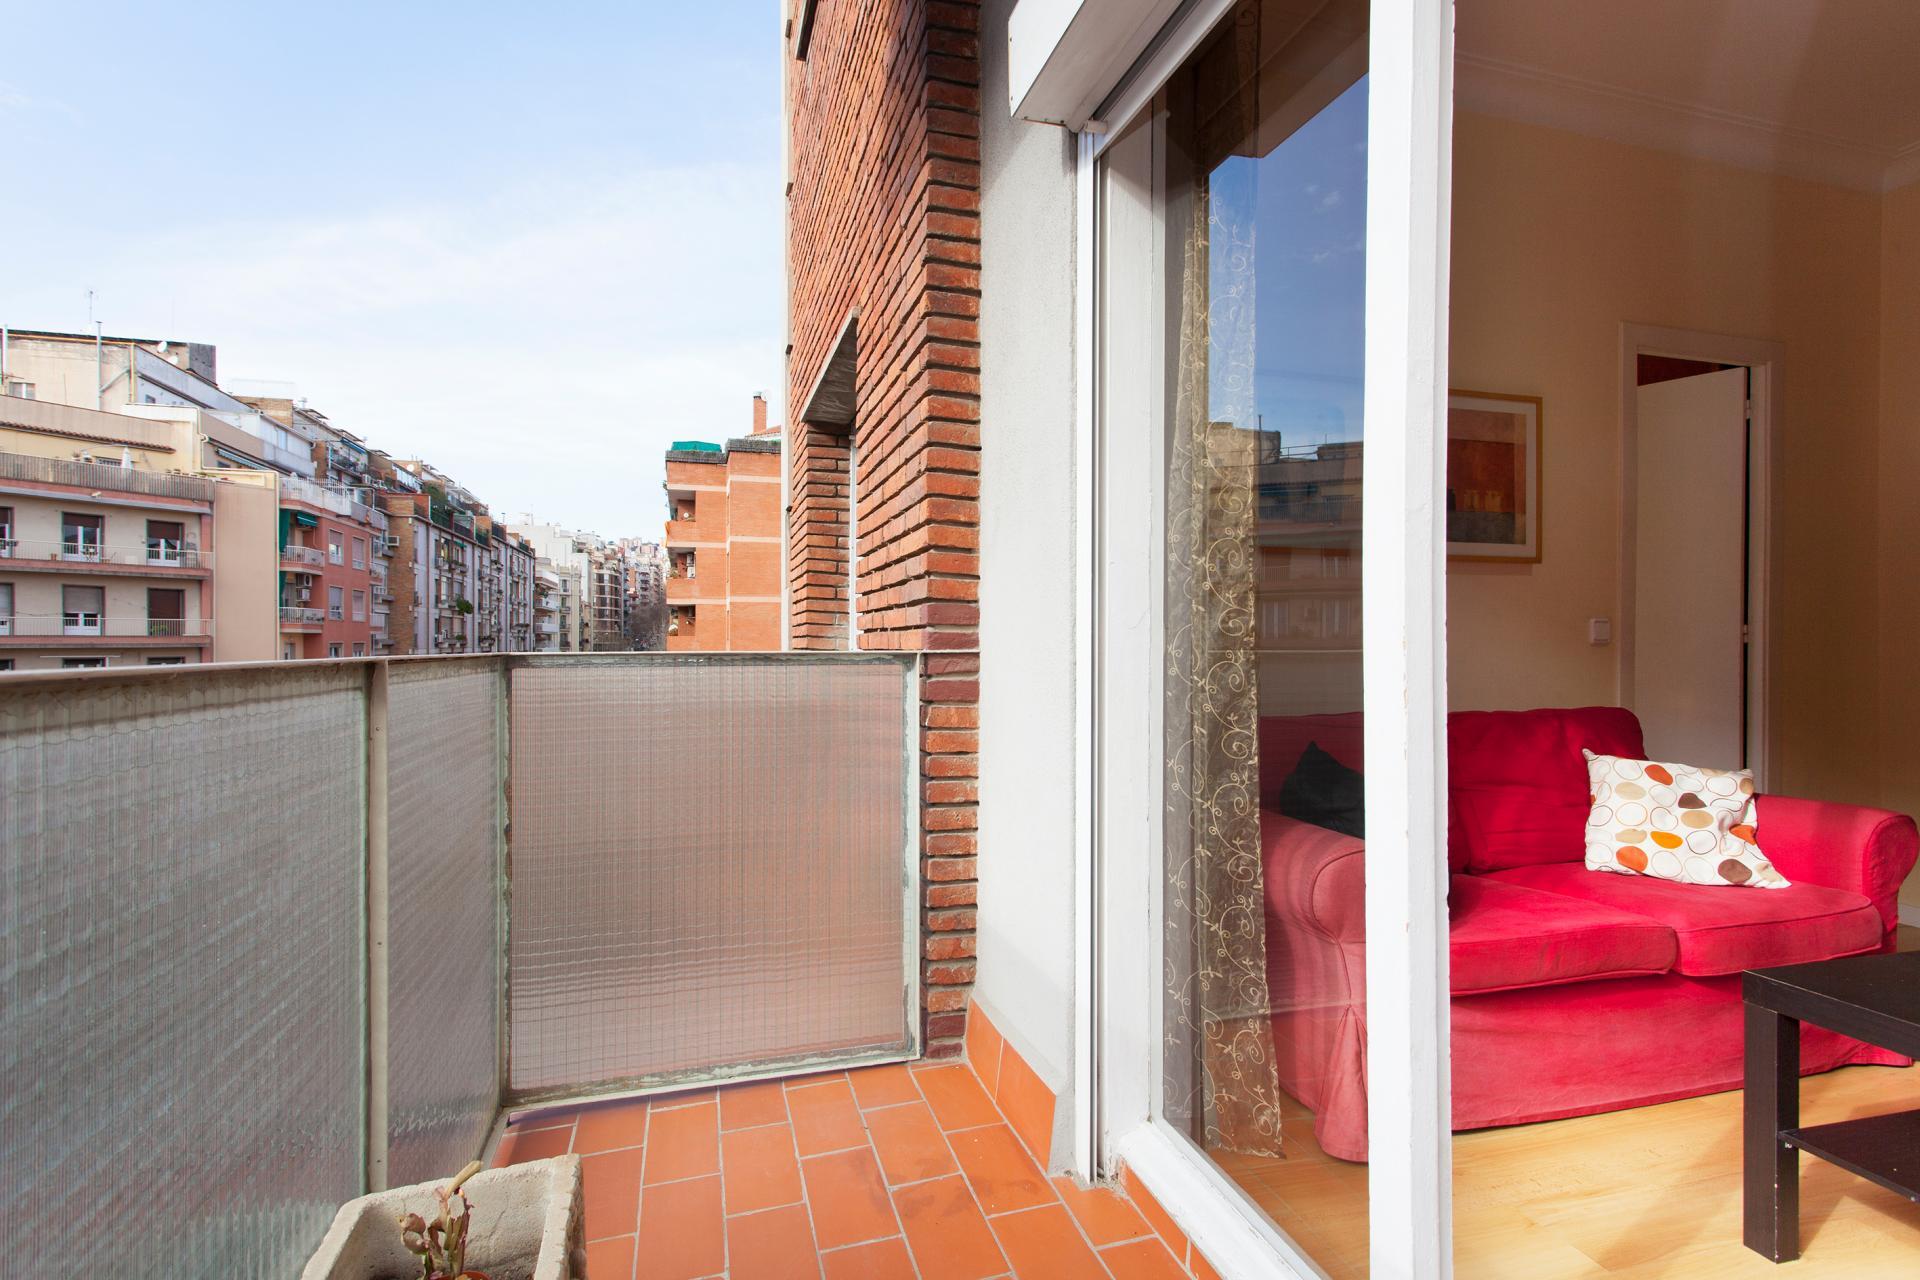 Piso en alquiler barcelona l 39 eixample padilla avenida gaudi - Alquiler pisos barcelona eixample ...